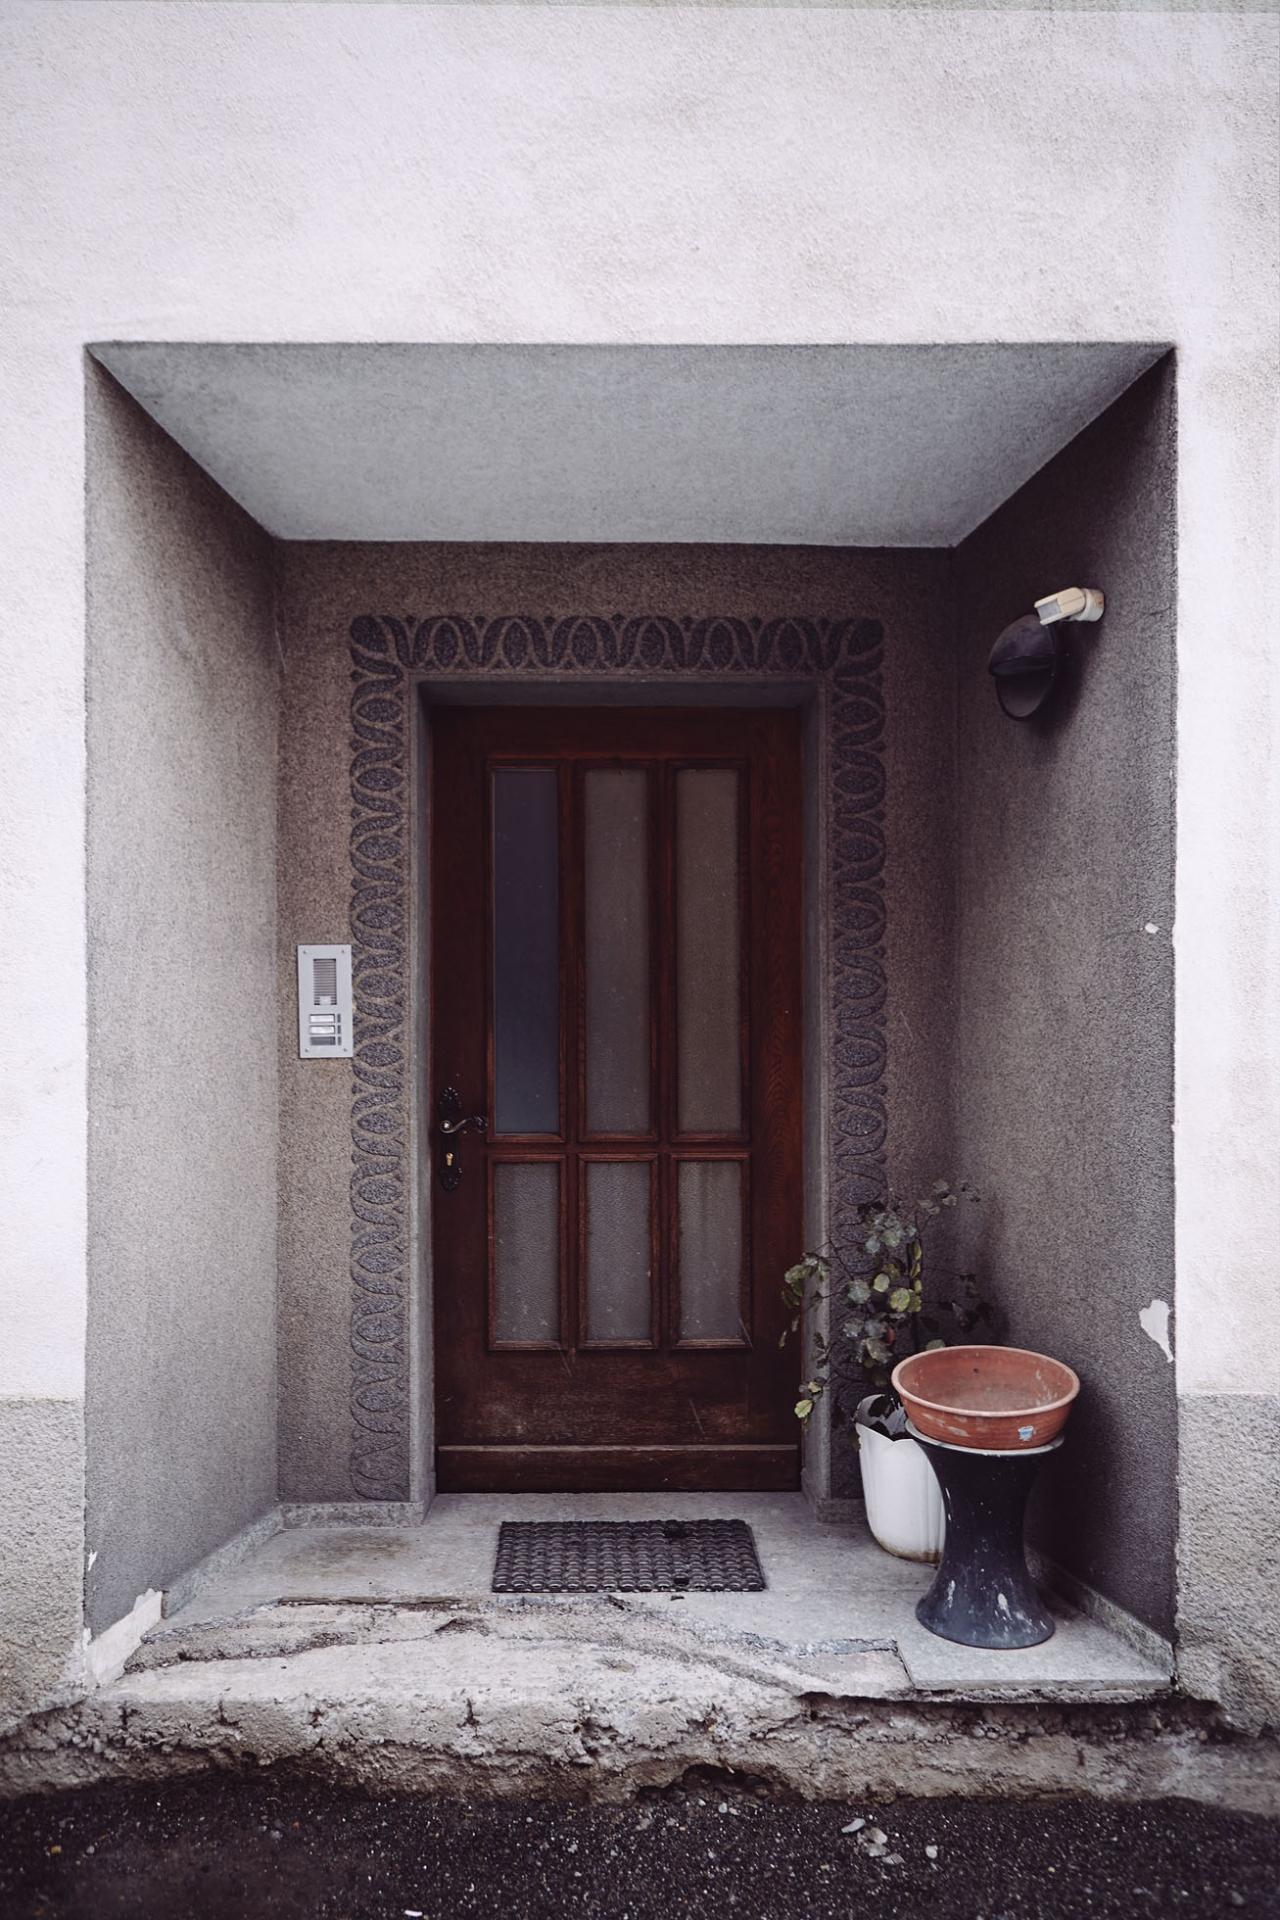 lukasgaechter.com hometown